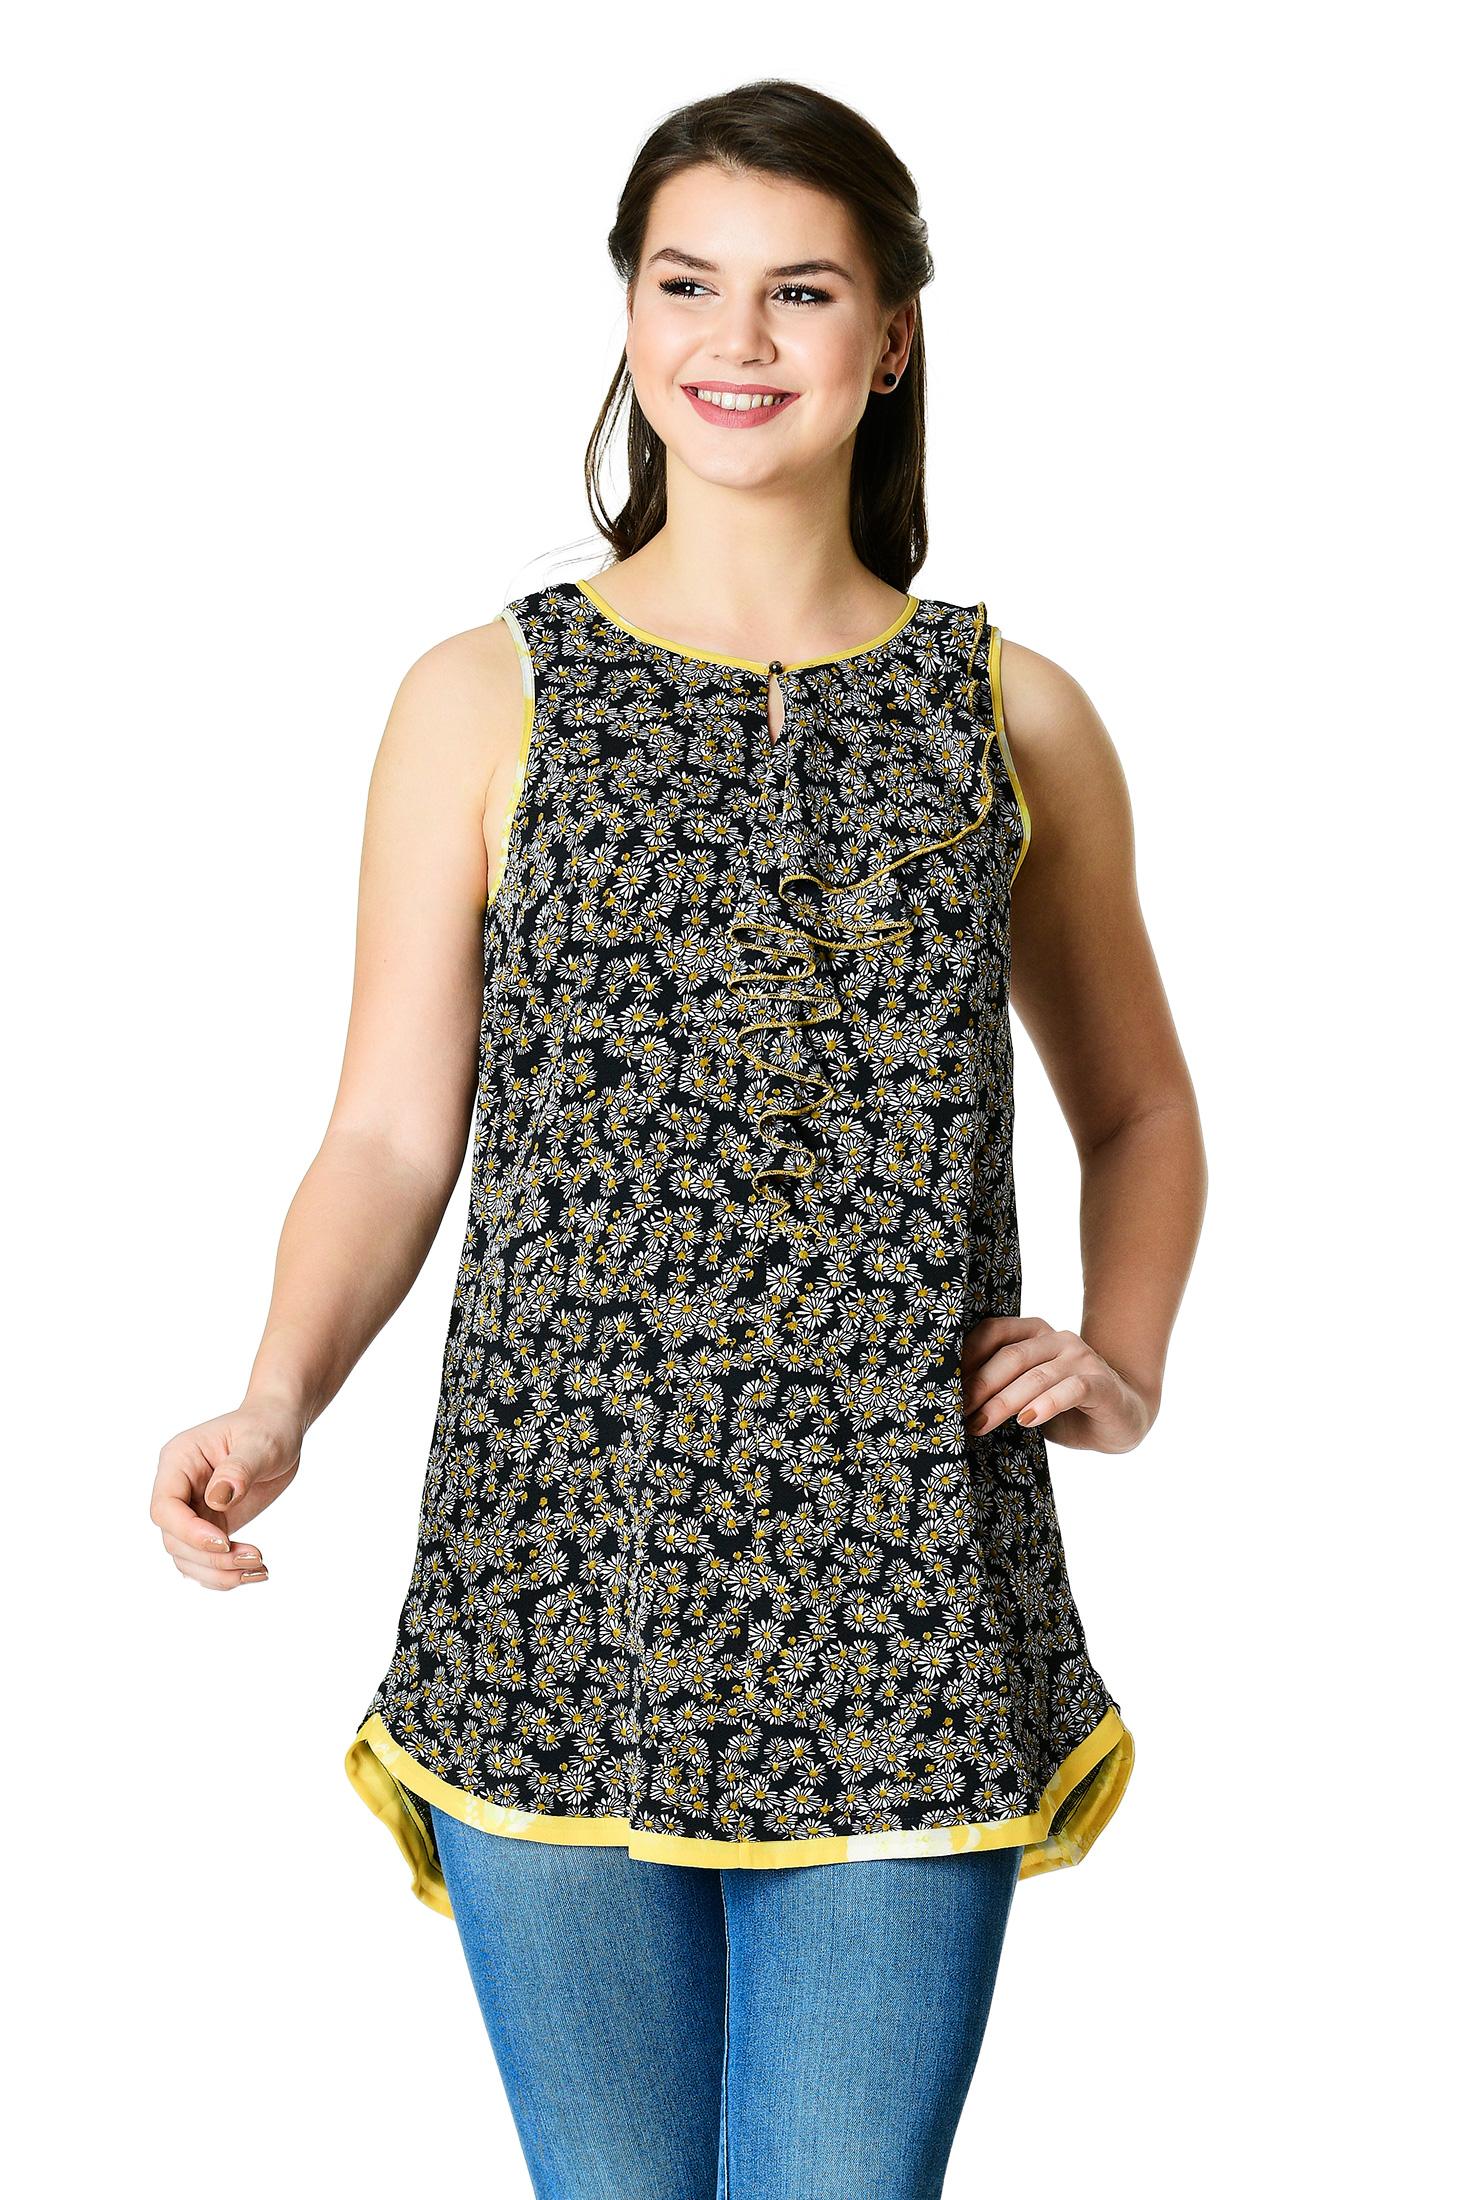 a4fd4484af8ce Women s Fashion Clothing 0-36W and Custom